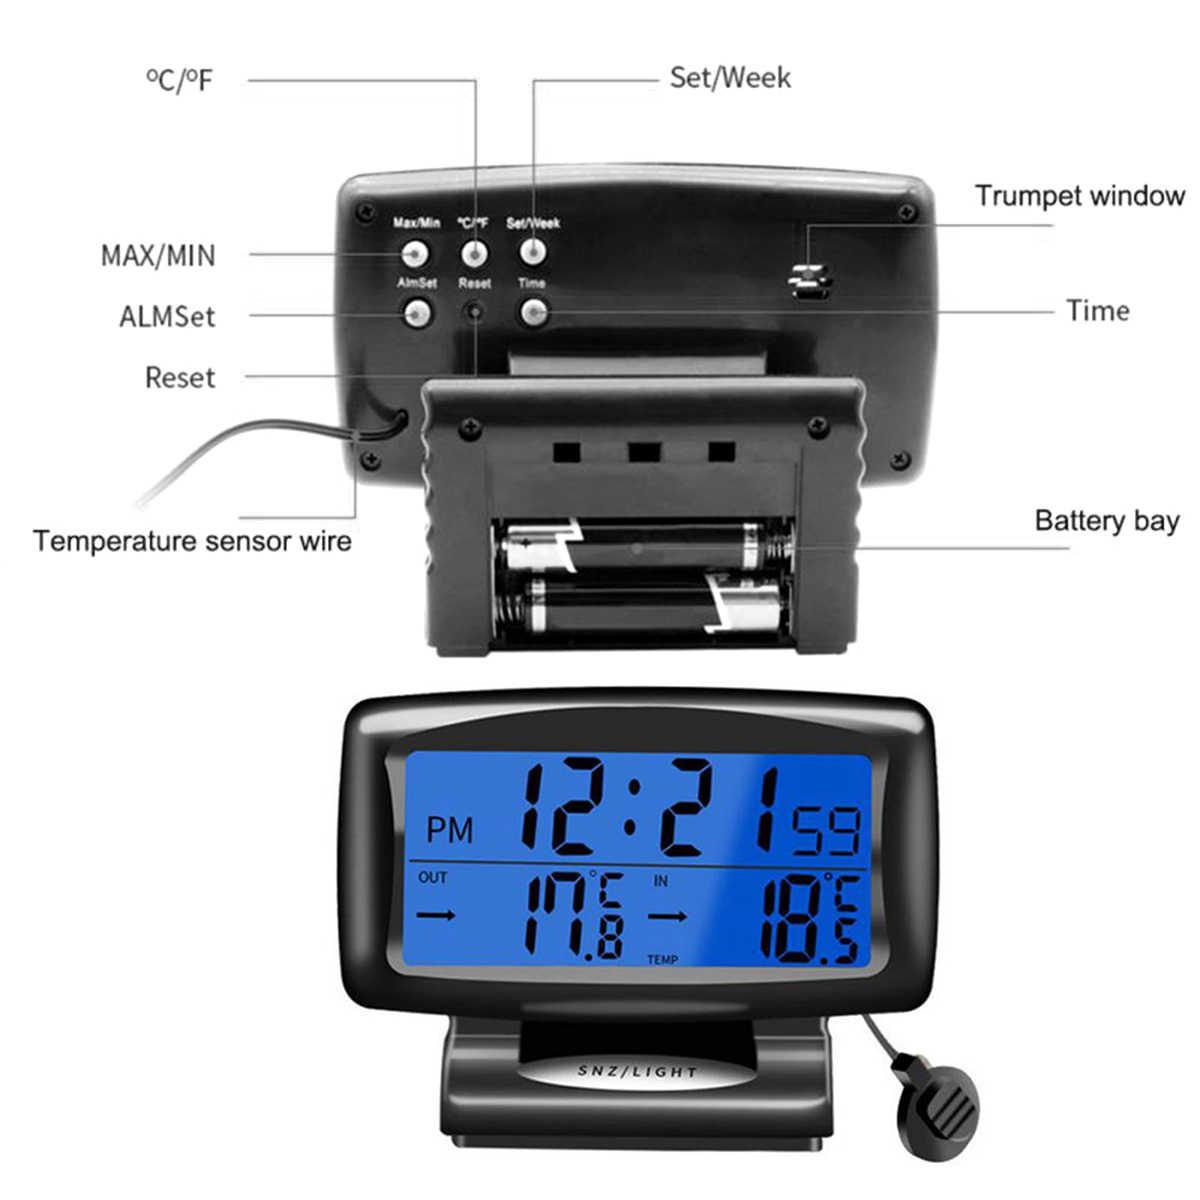 220V PT-6 Thermometer 50℃~+110℃ LED Digital Display Temperature Meter Aquarium